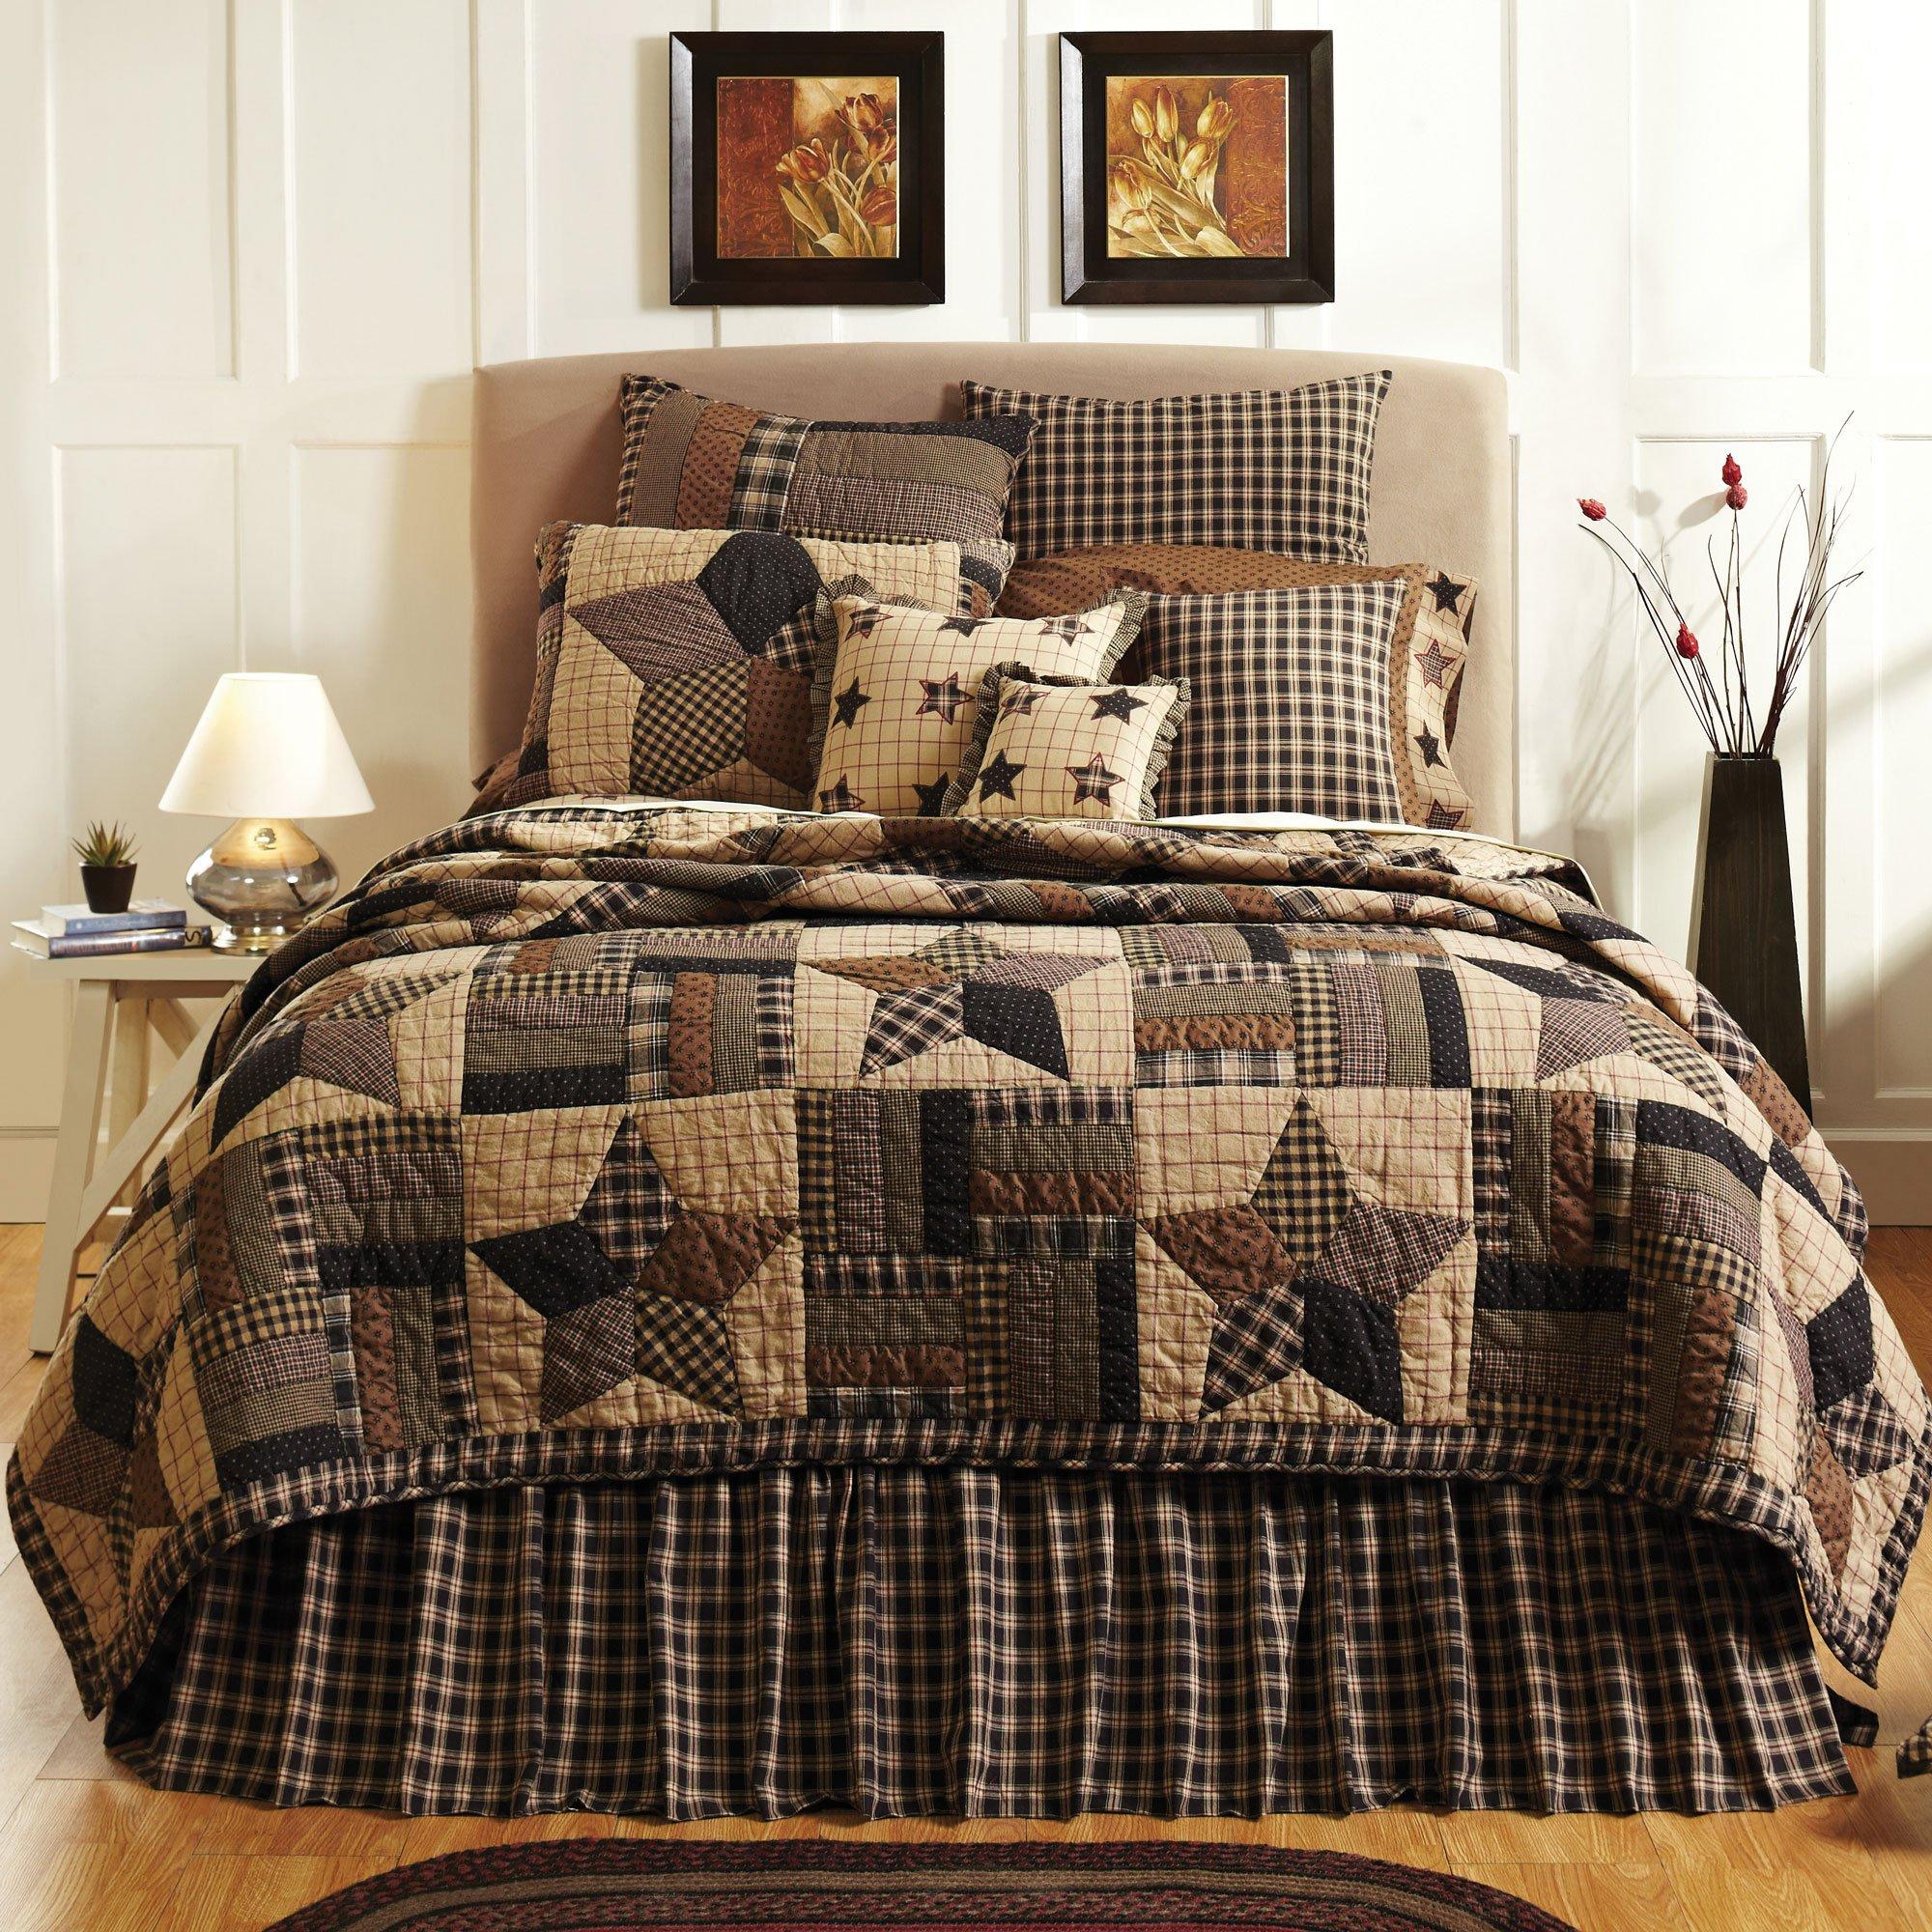 Bingham Star Queen Quilt Bundle - 5 Pc Set. Set Contents: 1 Queen Quilt (94 x 94), 2 Queen Shams (21 x 27), 1 Queen Bed Skirt (80 x 60), 1 Pillow 1 (16 x 16)